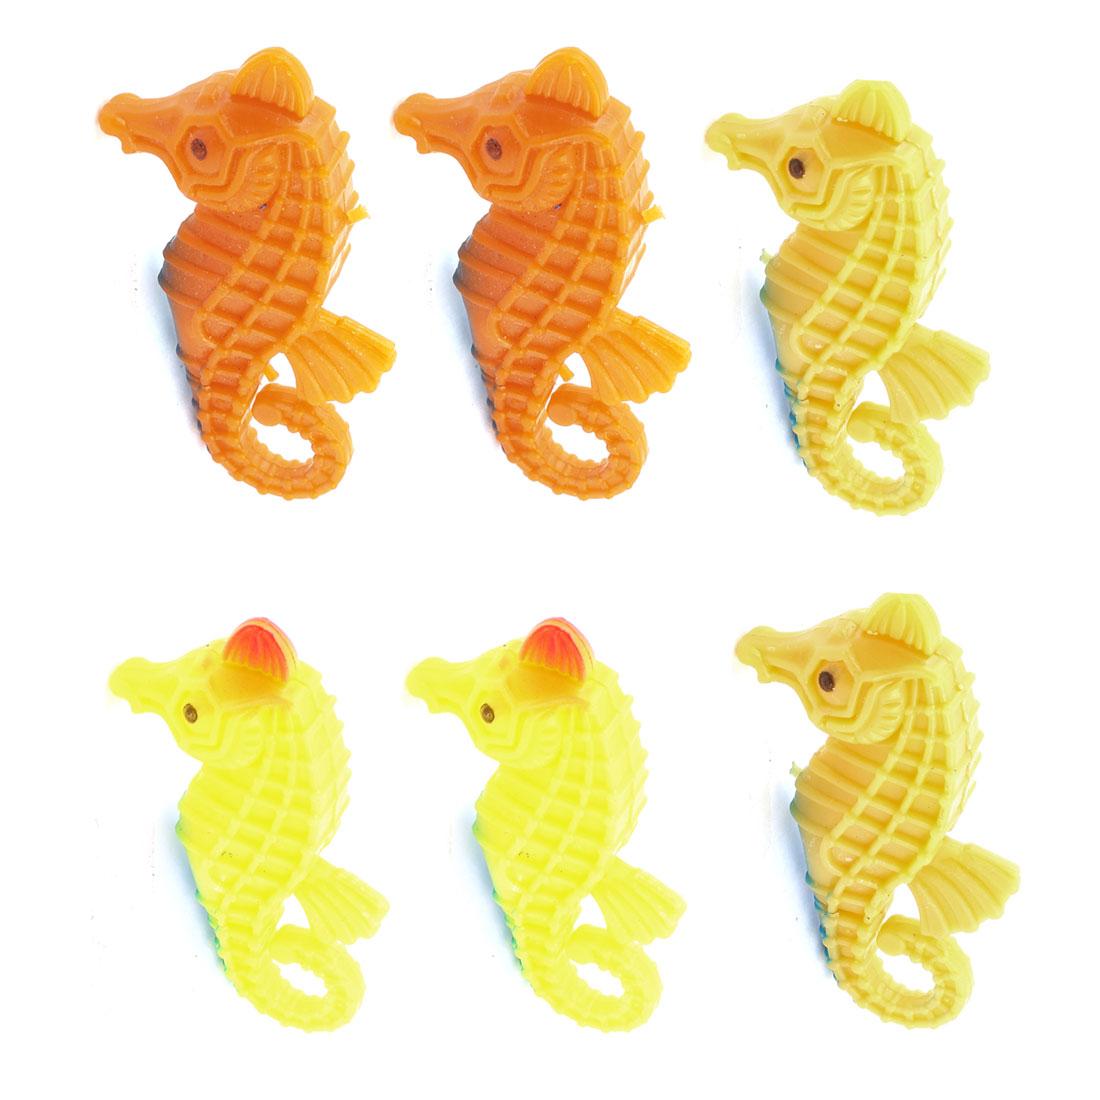 Aquarium Fish Tank Ornament Brown Yellow Orange Artificial Seahorse 6 Pcs